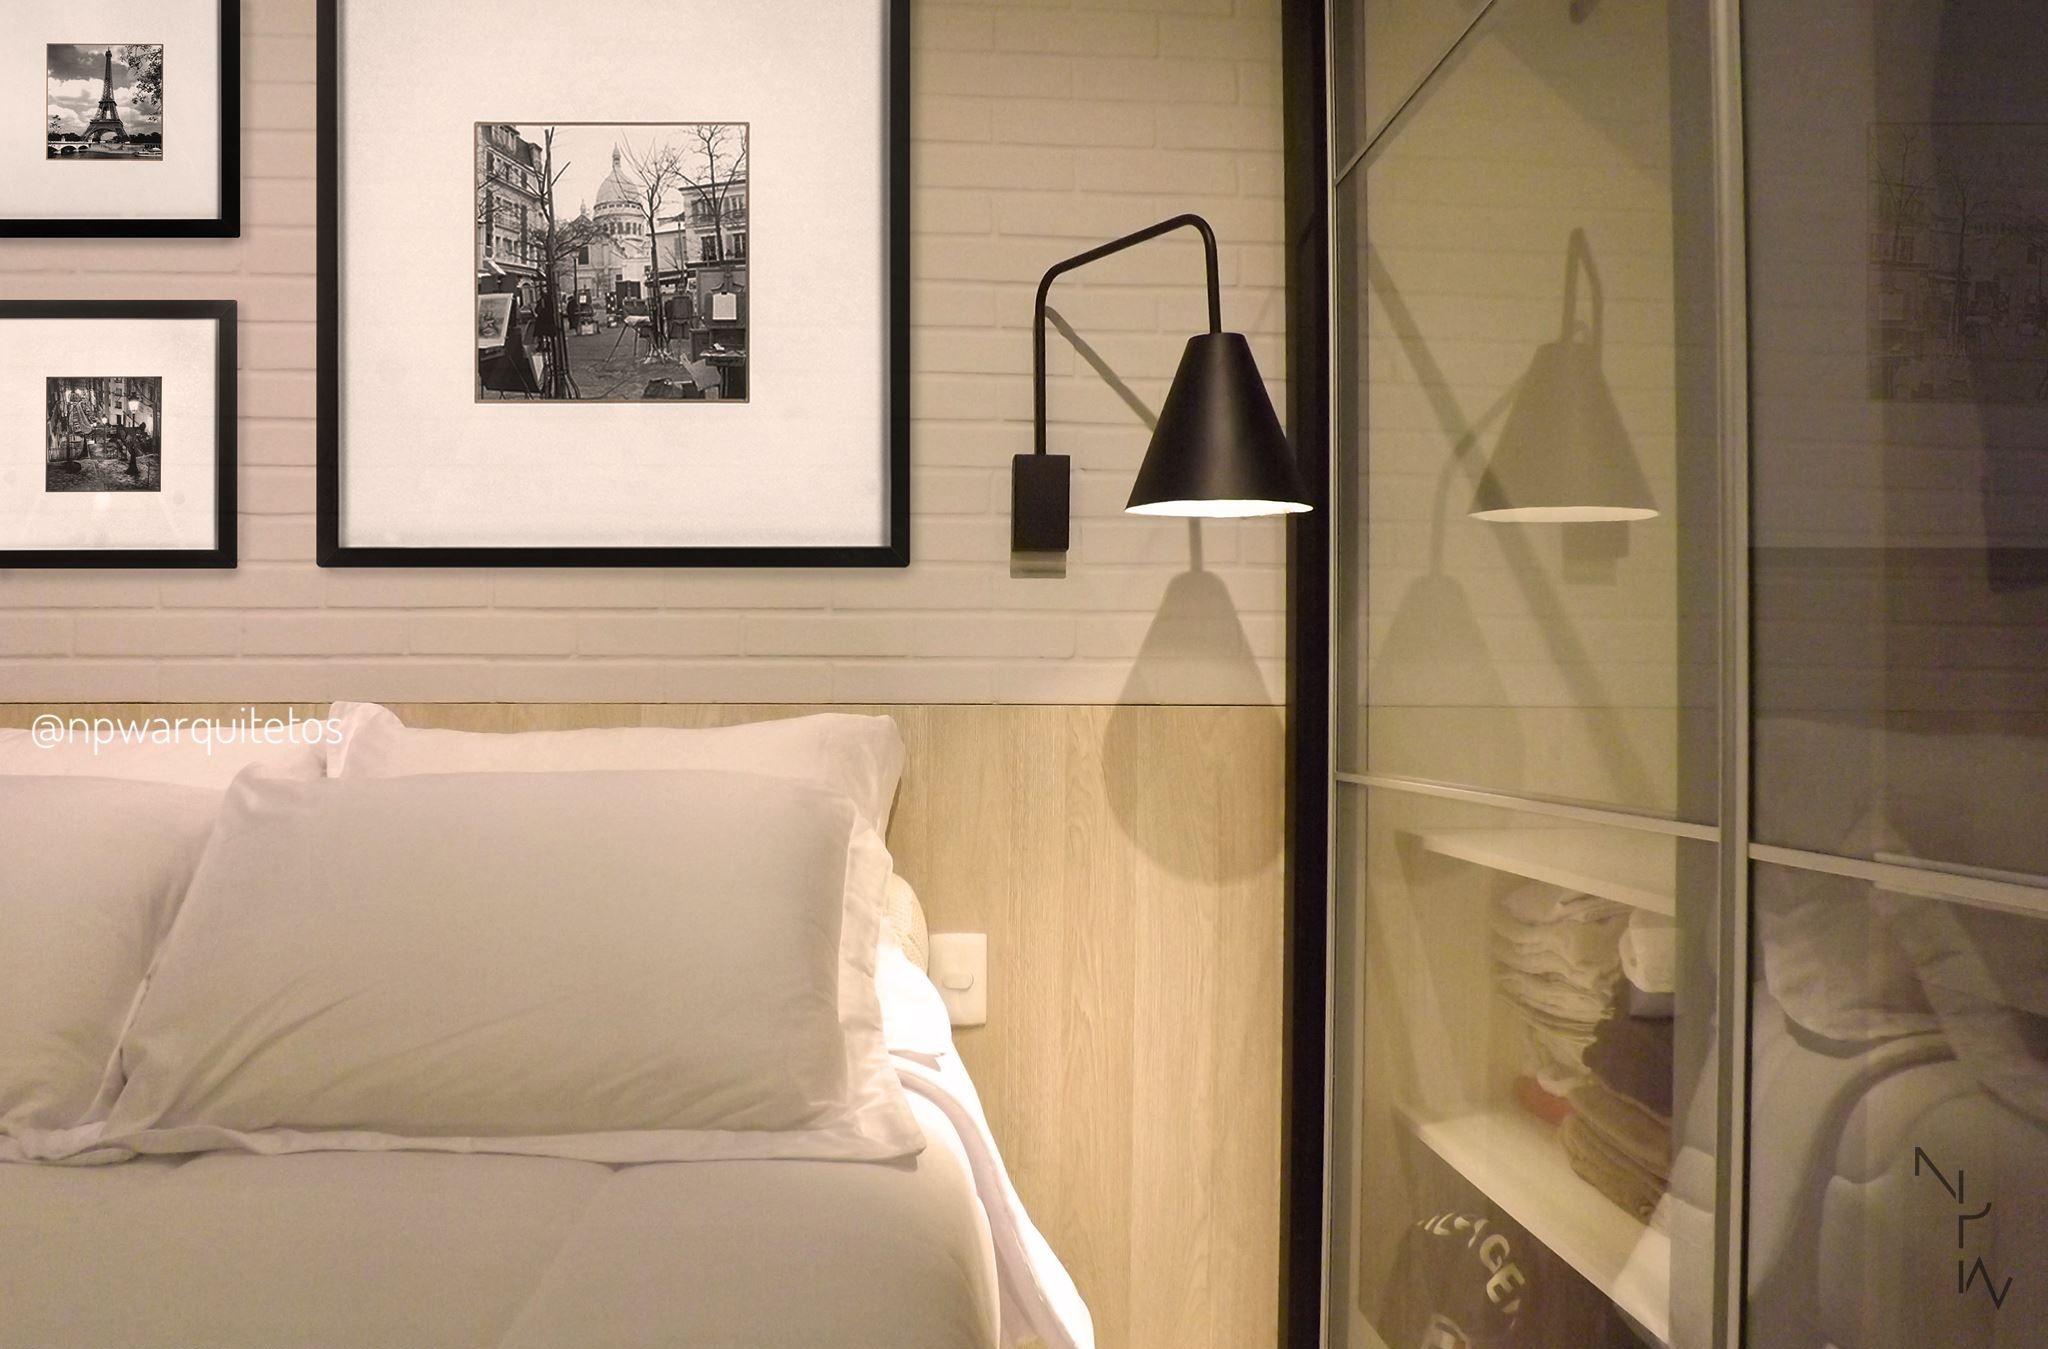 Quarto de Hóspedes/Guests Room - Apartamento JD/JD Apartment NPW Arquitetos